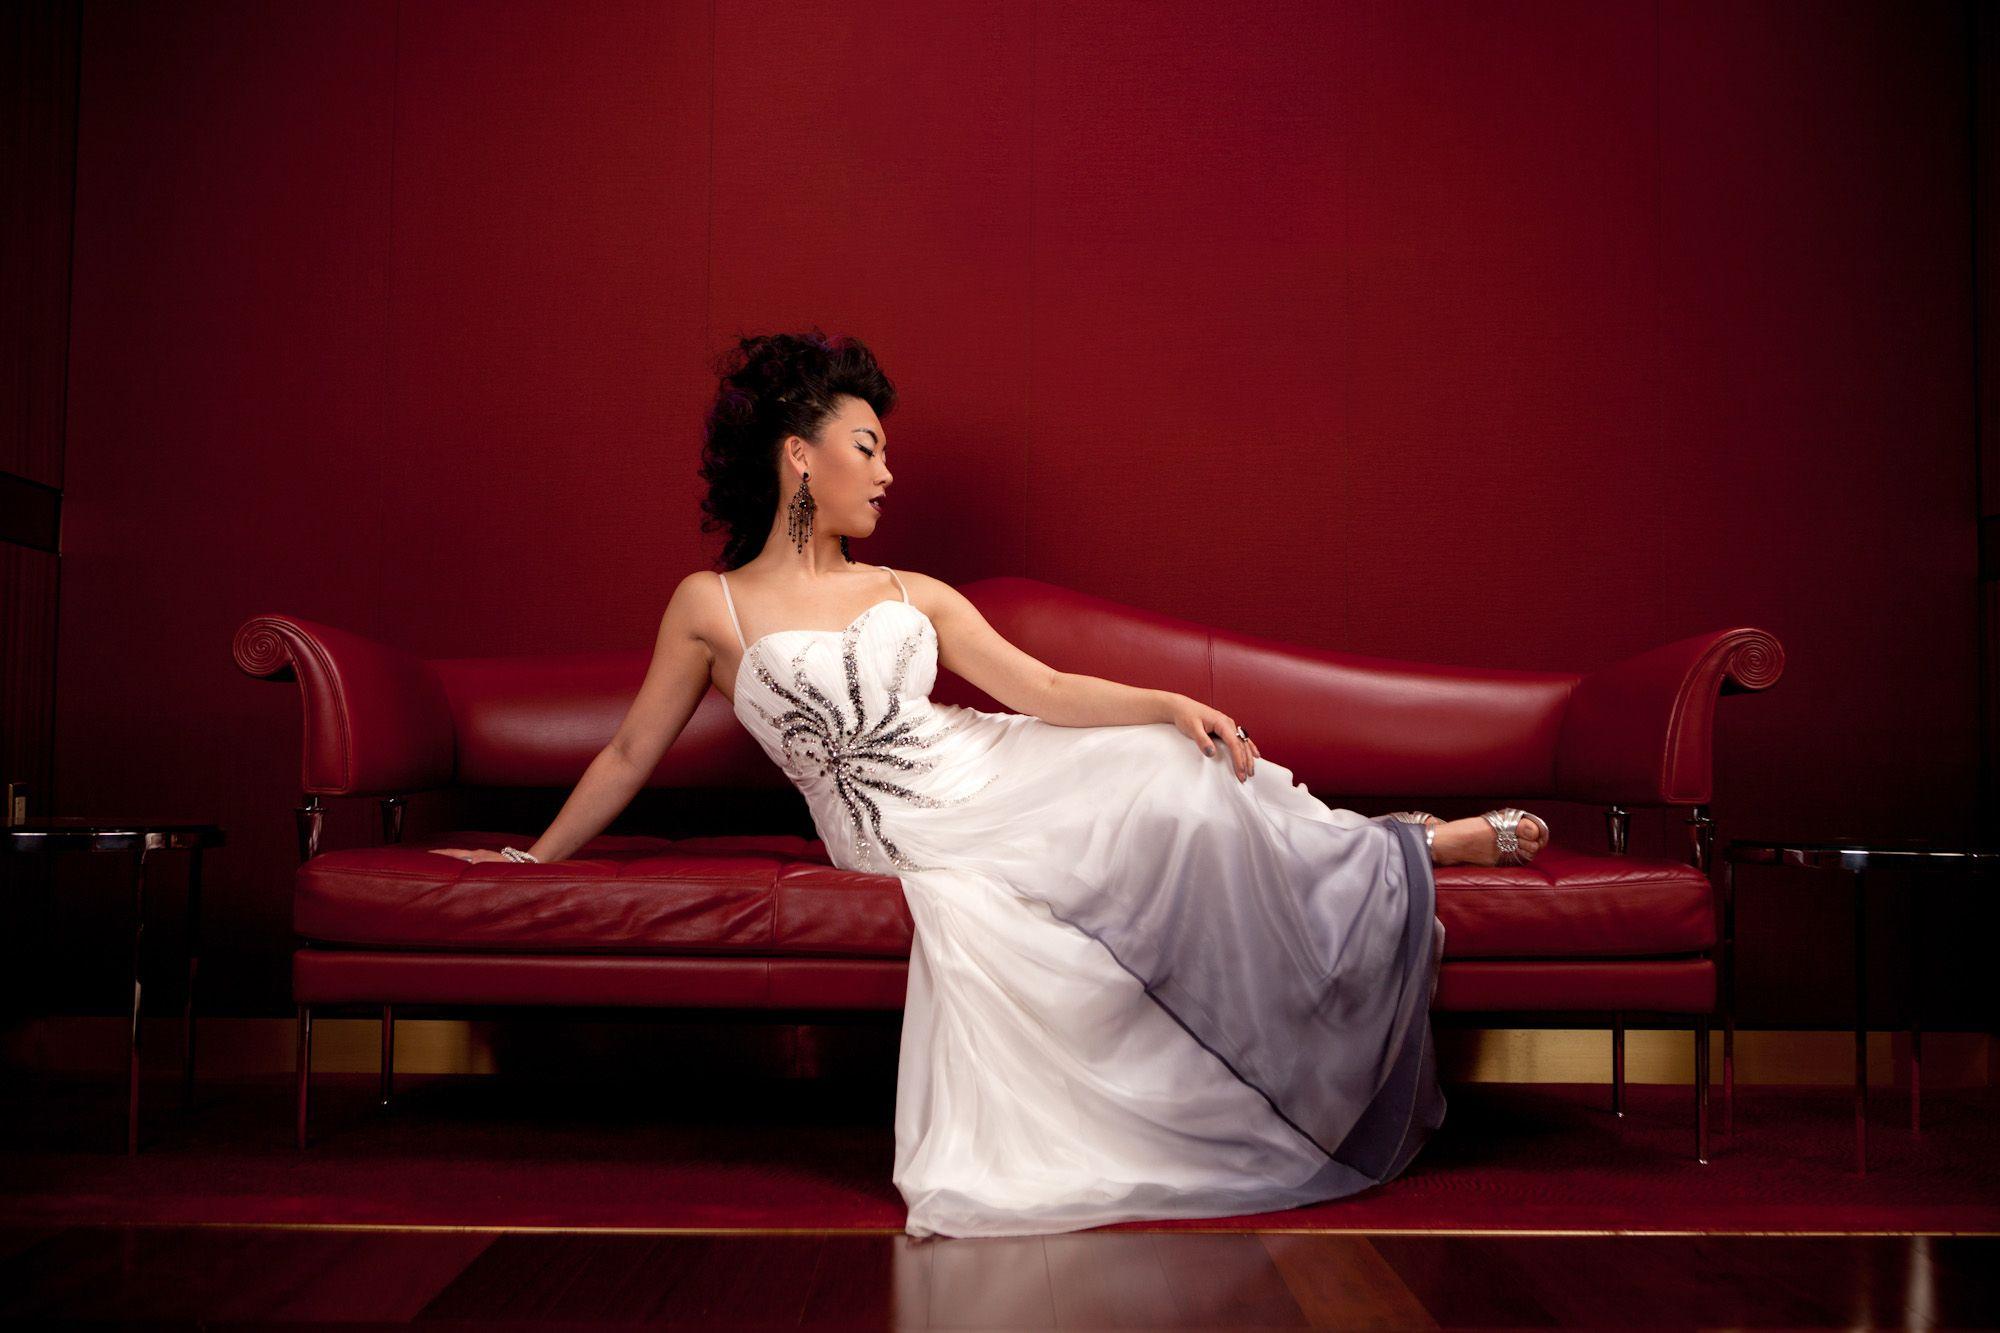 ignited Photography - Stylized Fashion - Stylist: Kait Wright - Model: Emily - Strobe Lighting - Orchestra Hall in Detroit